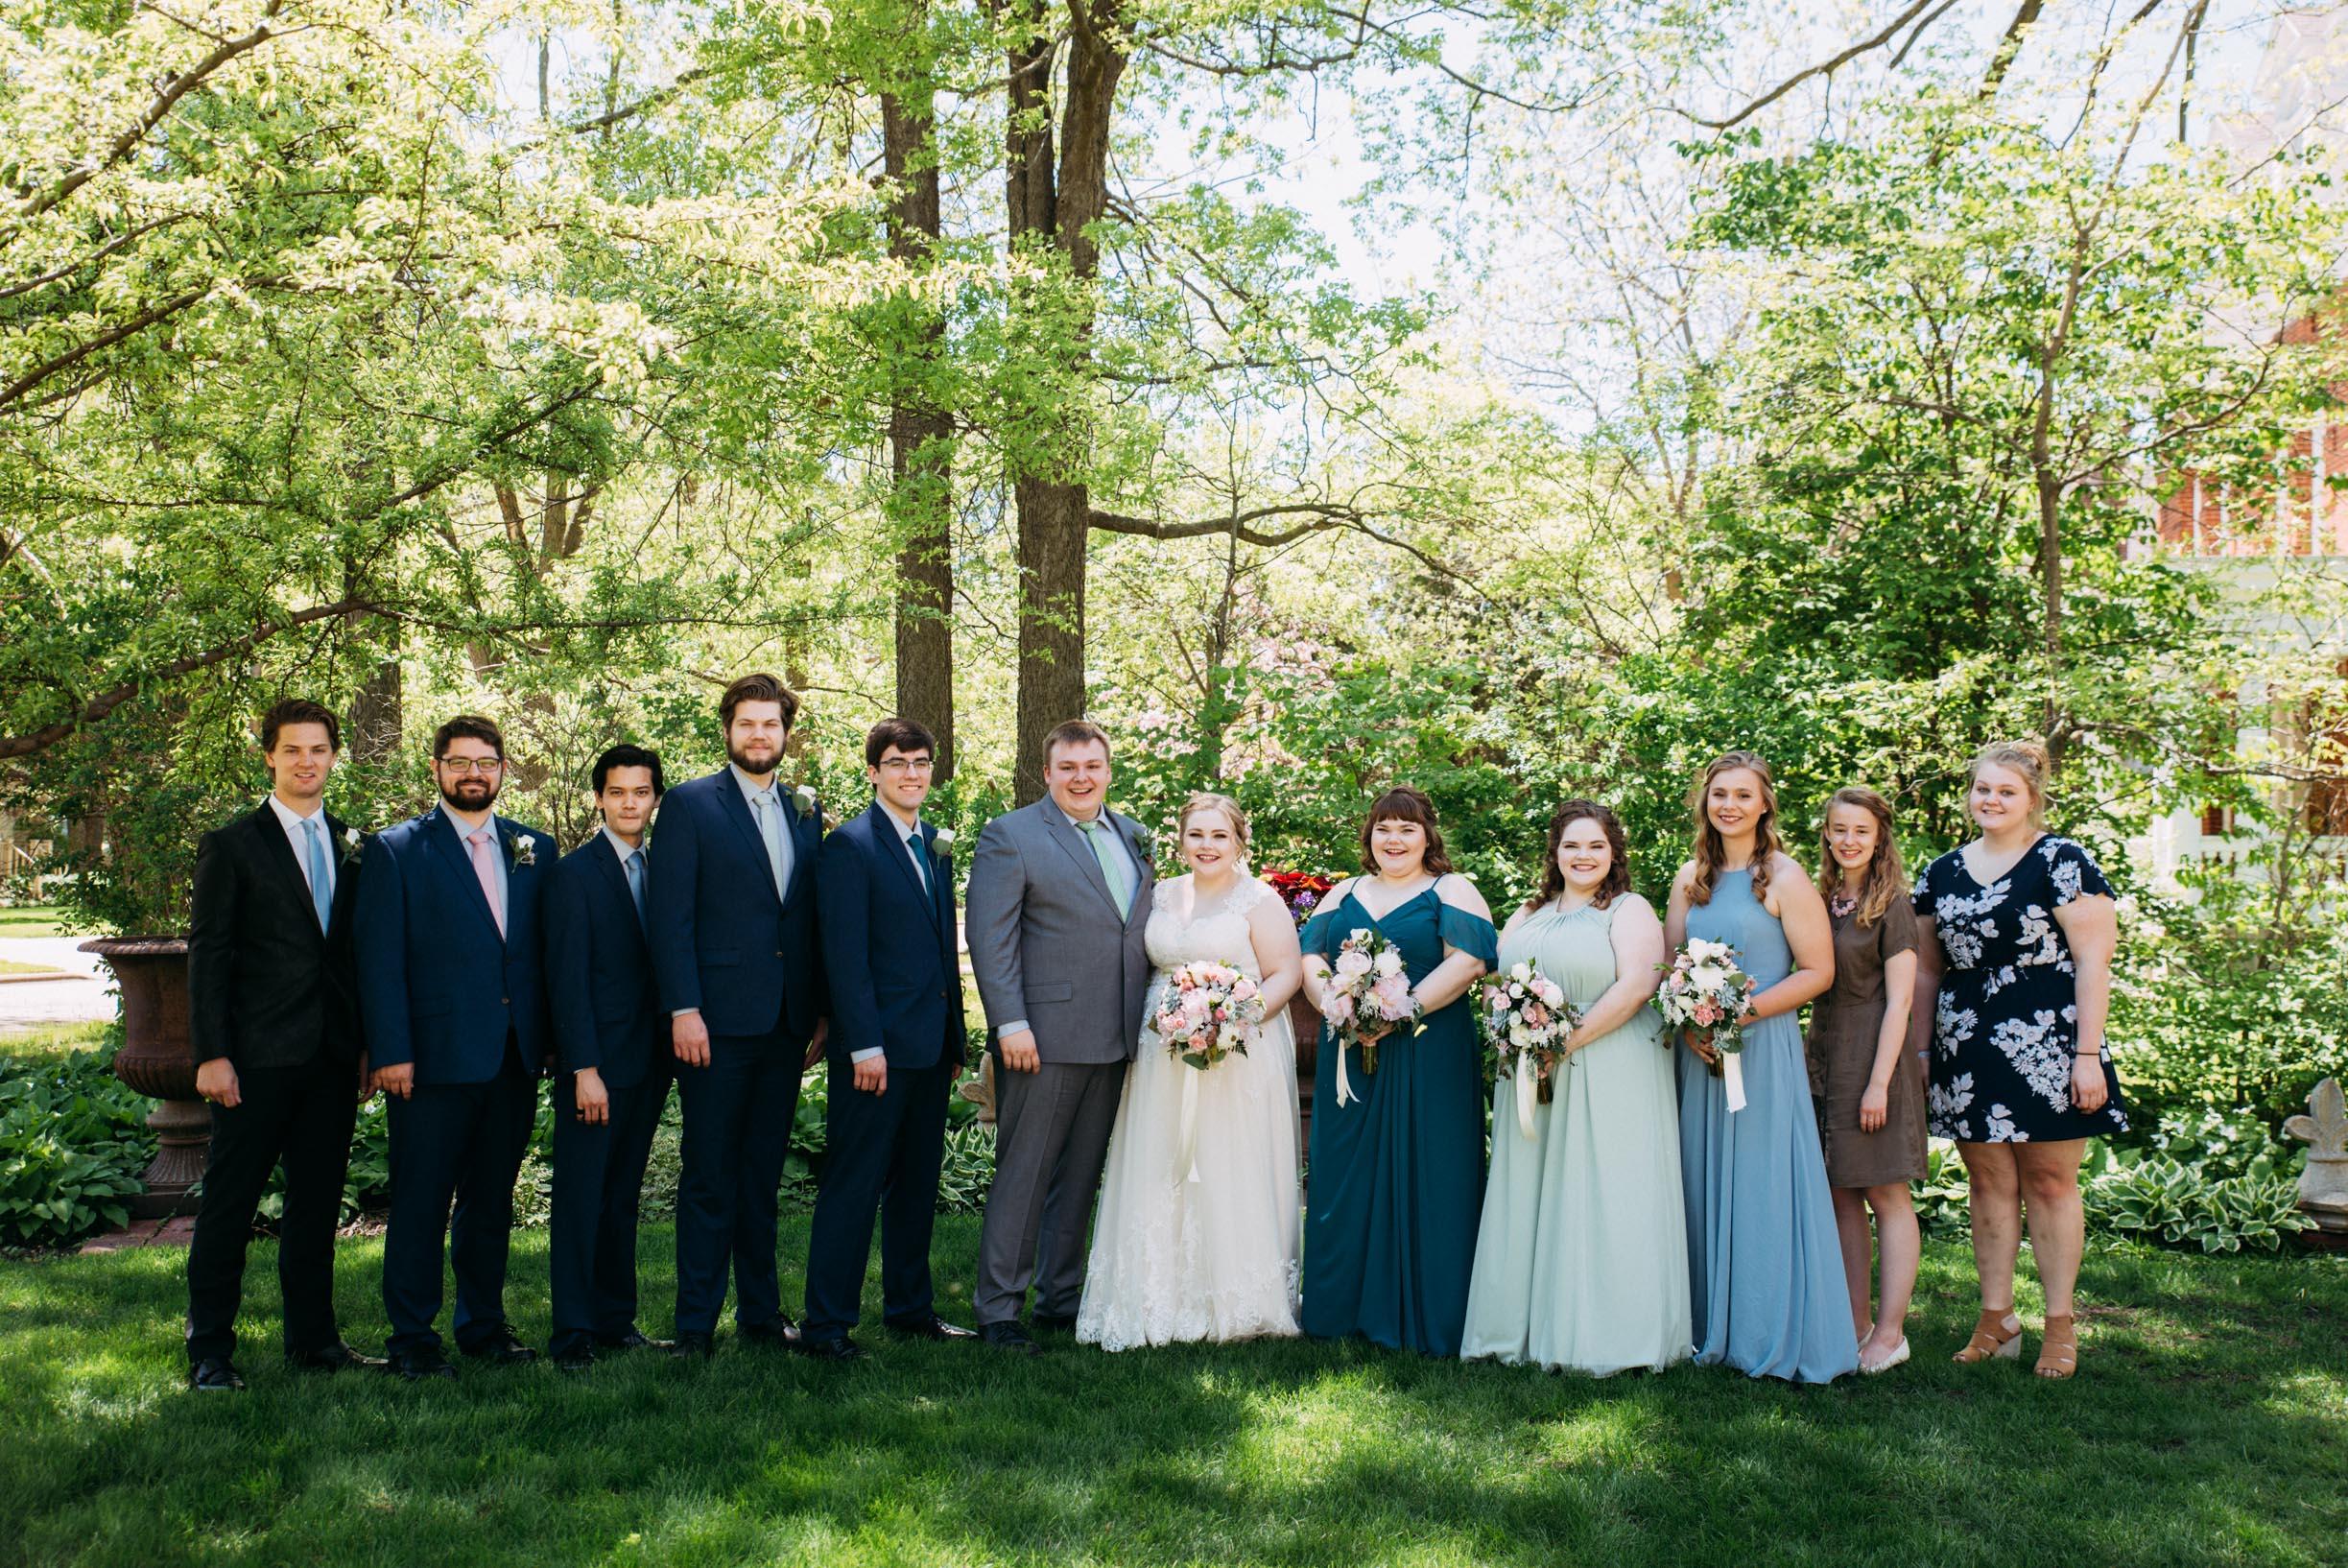 Hannah_Brandon_Wisconsin_Wedding_First_Look-15.jpg